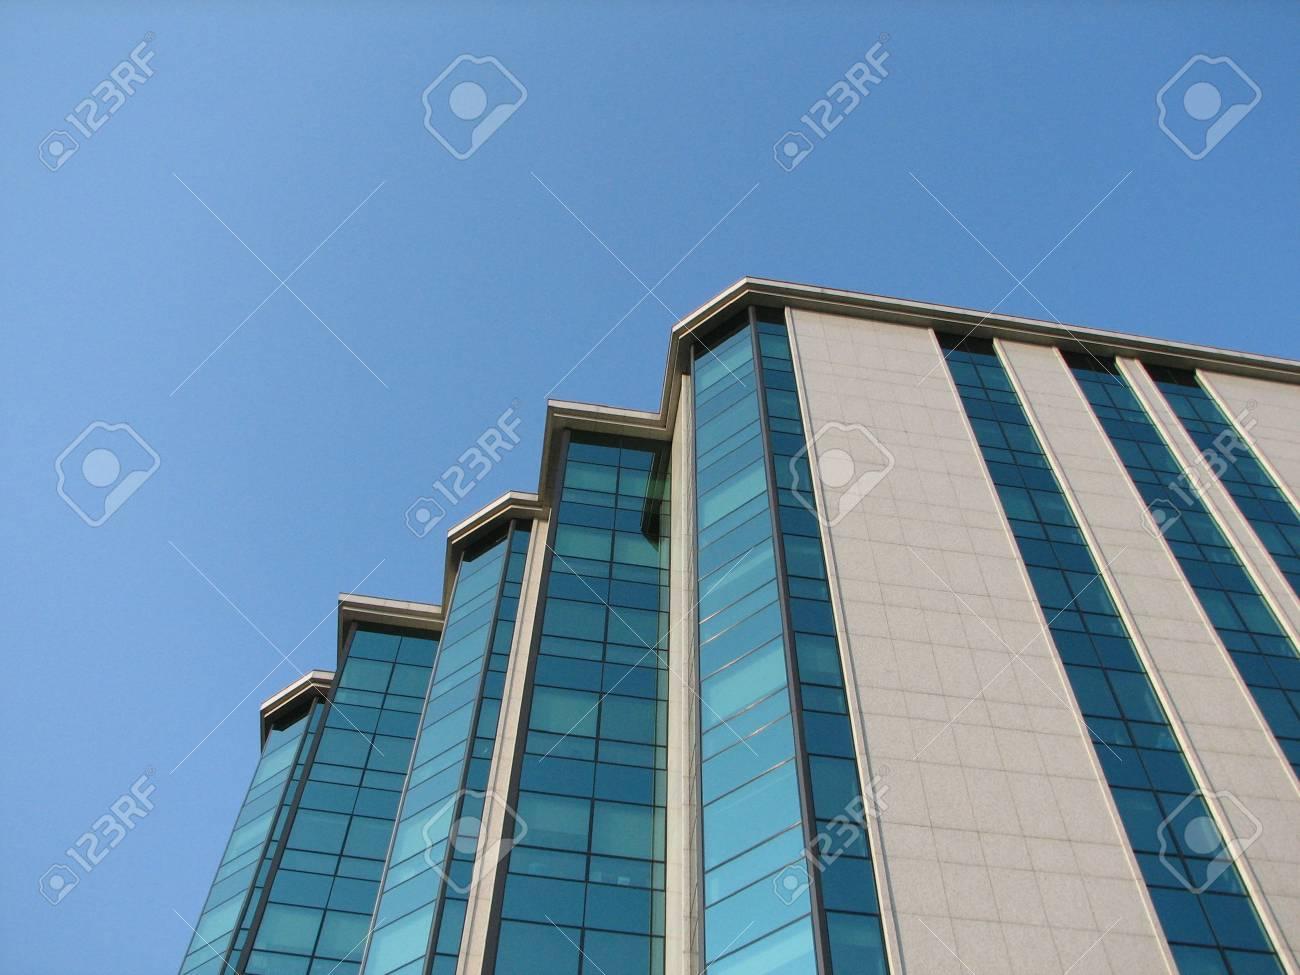 business building - 423344